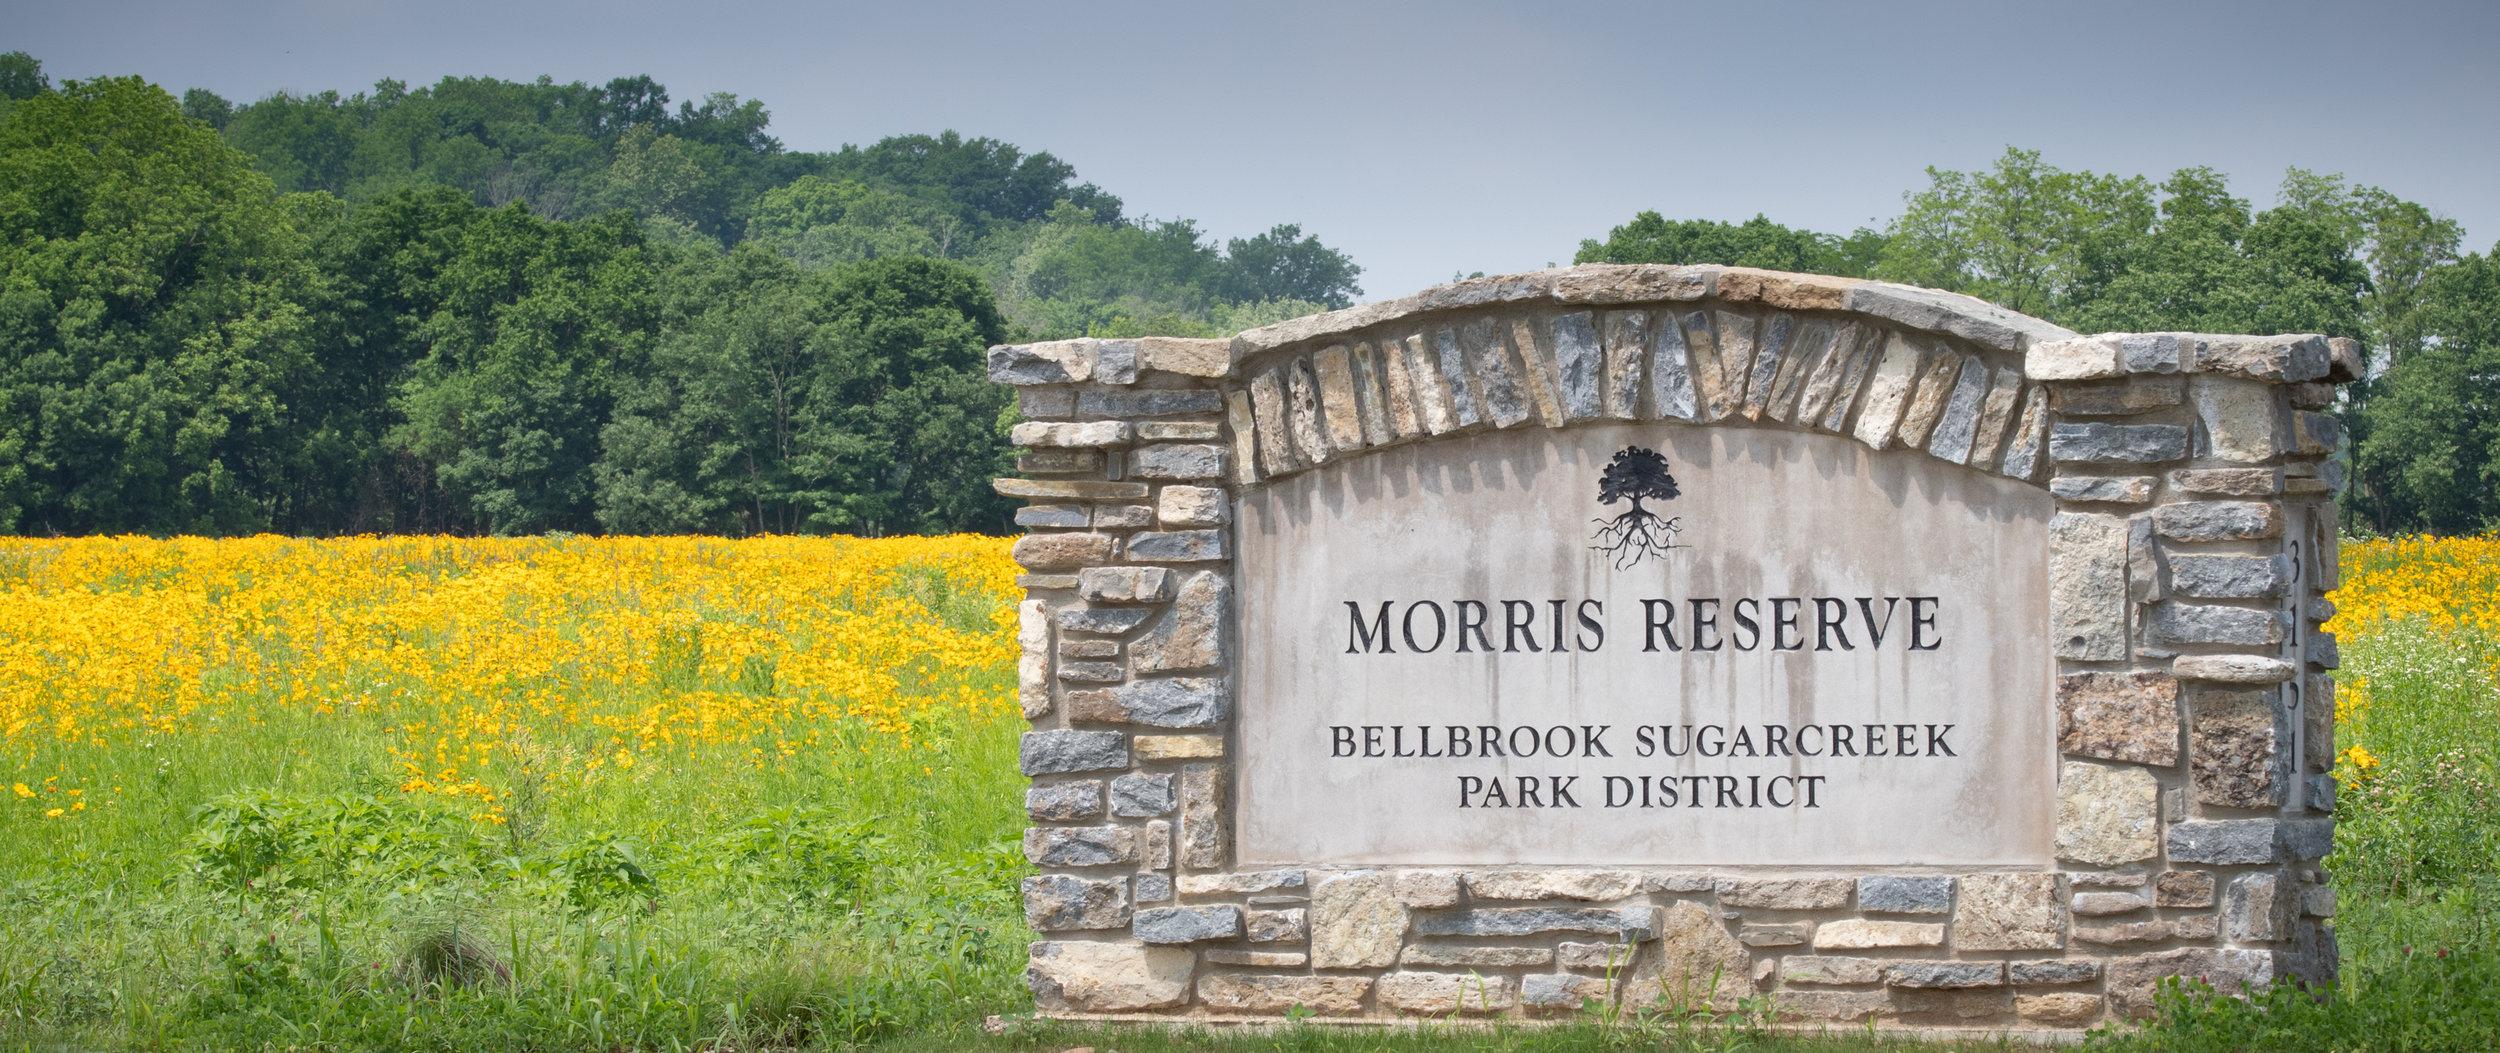 Morris Reserve - Bellbrook, Ohio